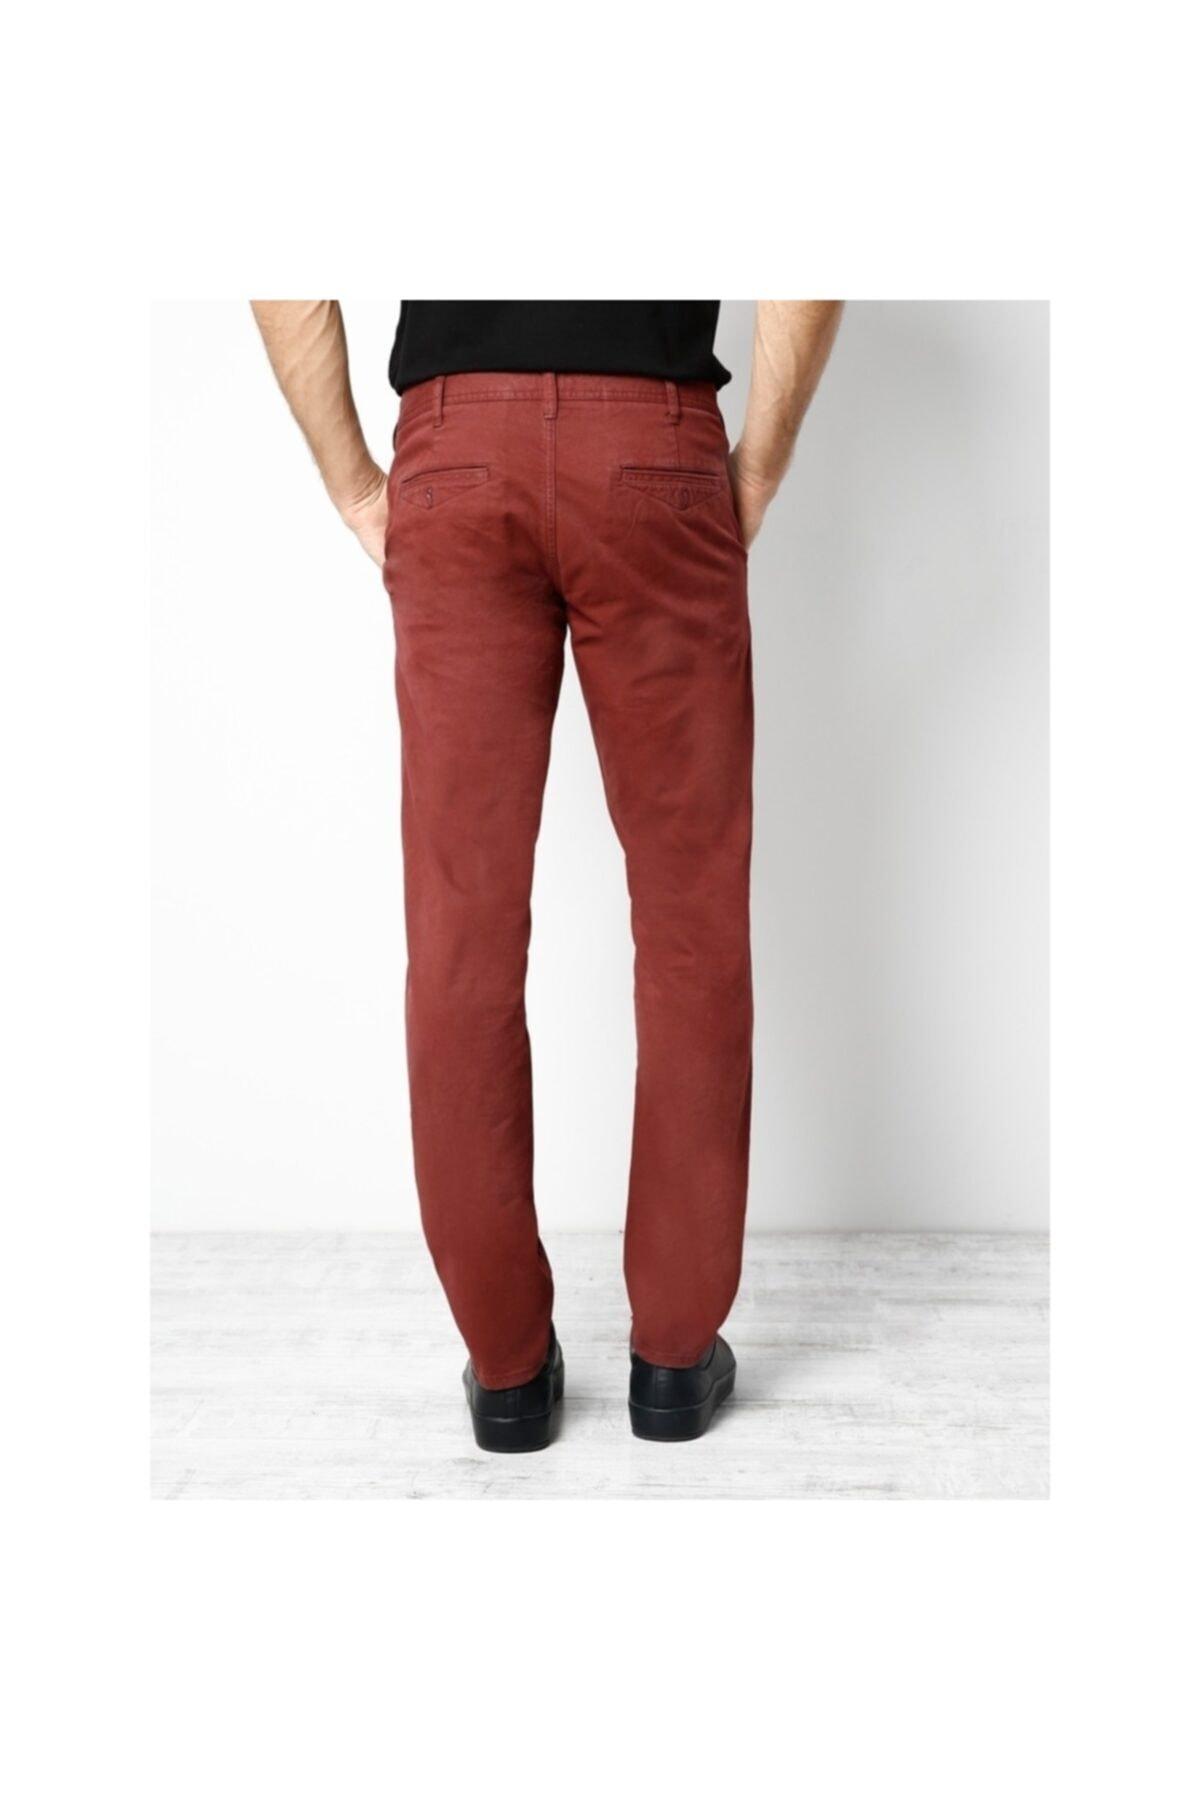 Colin's Bordo Erkek Pantolon